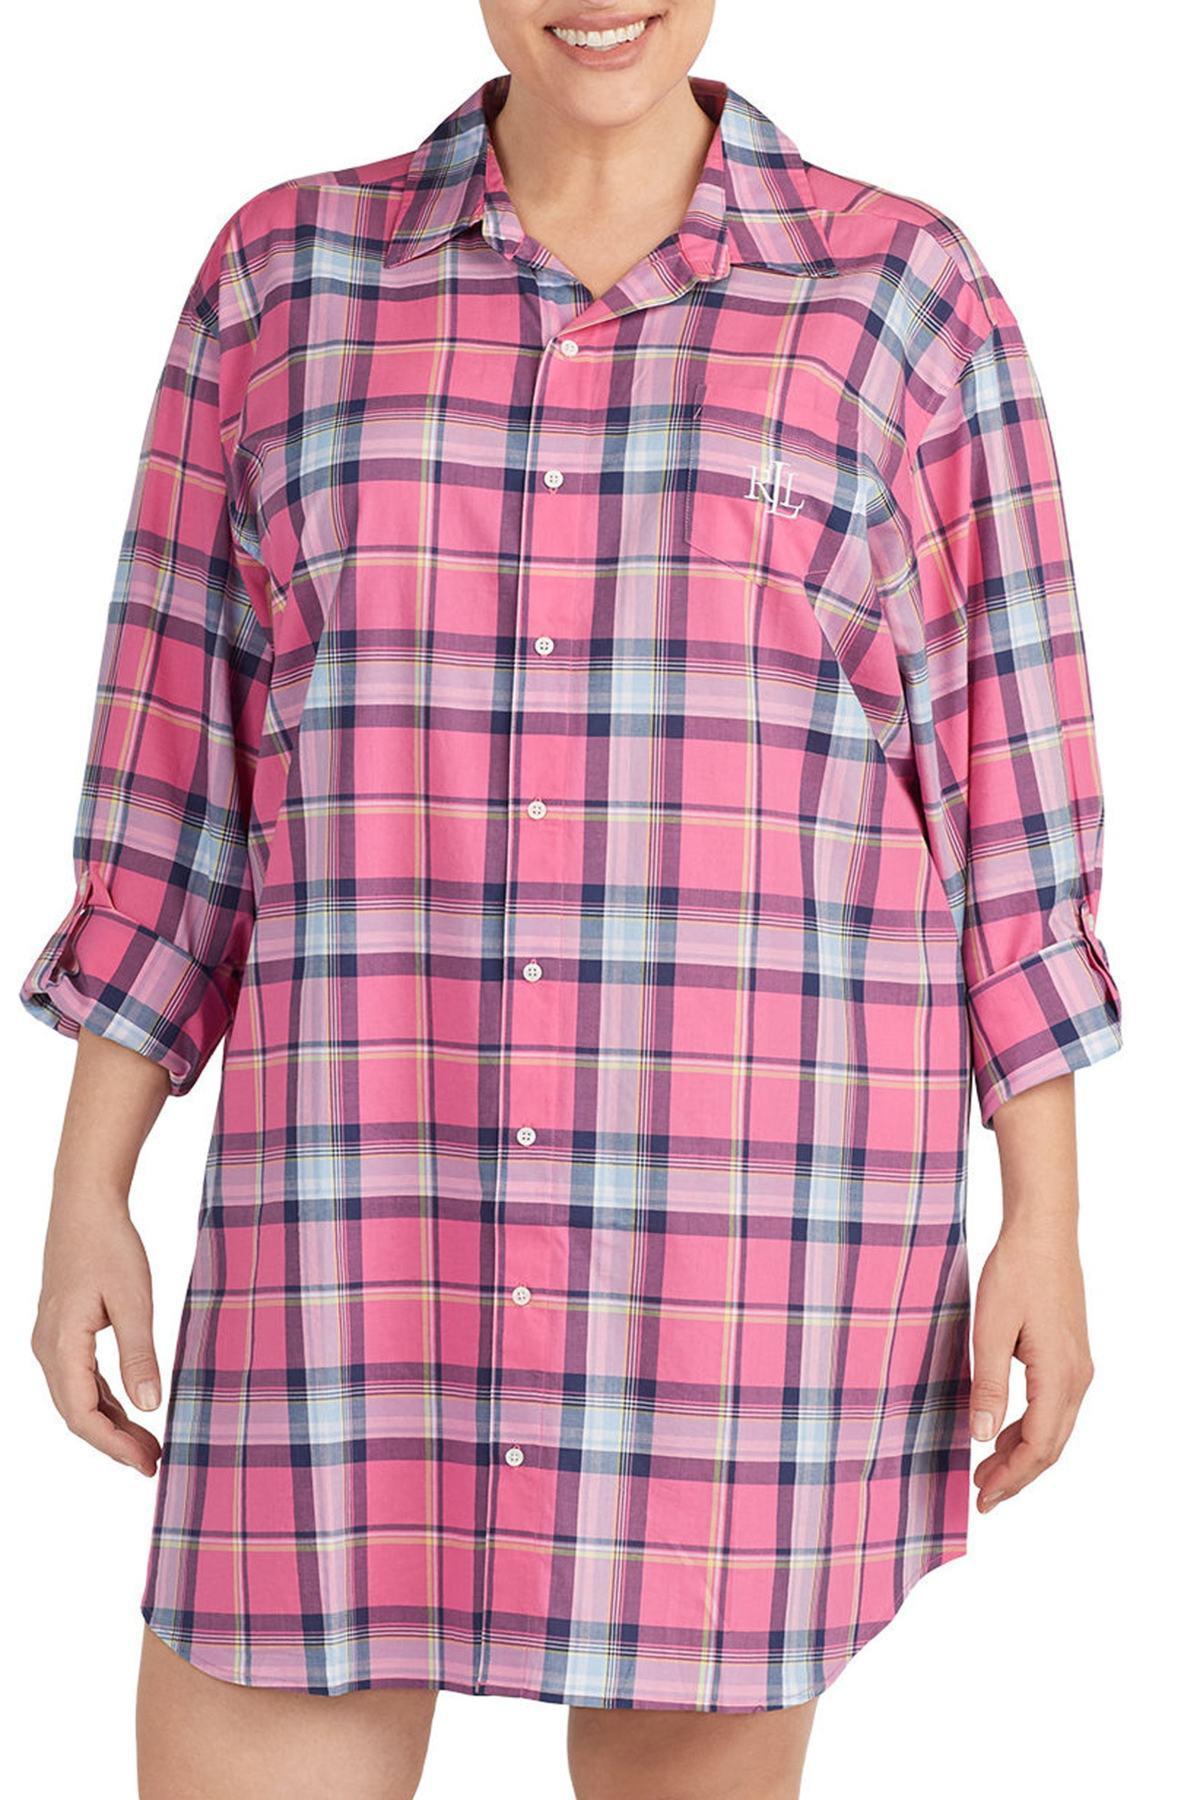 Lyst - Lauren By Ralph Lauren Plaid Sleep Shirt (plus Size) in Pink ... cb484f202